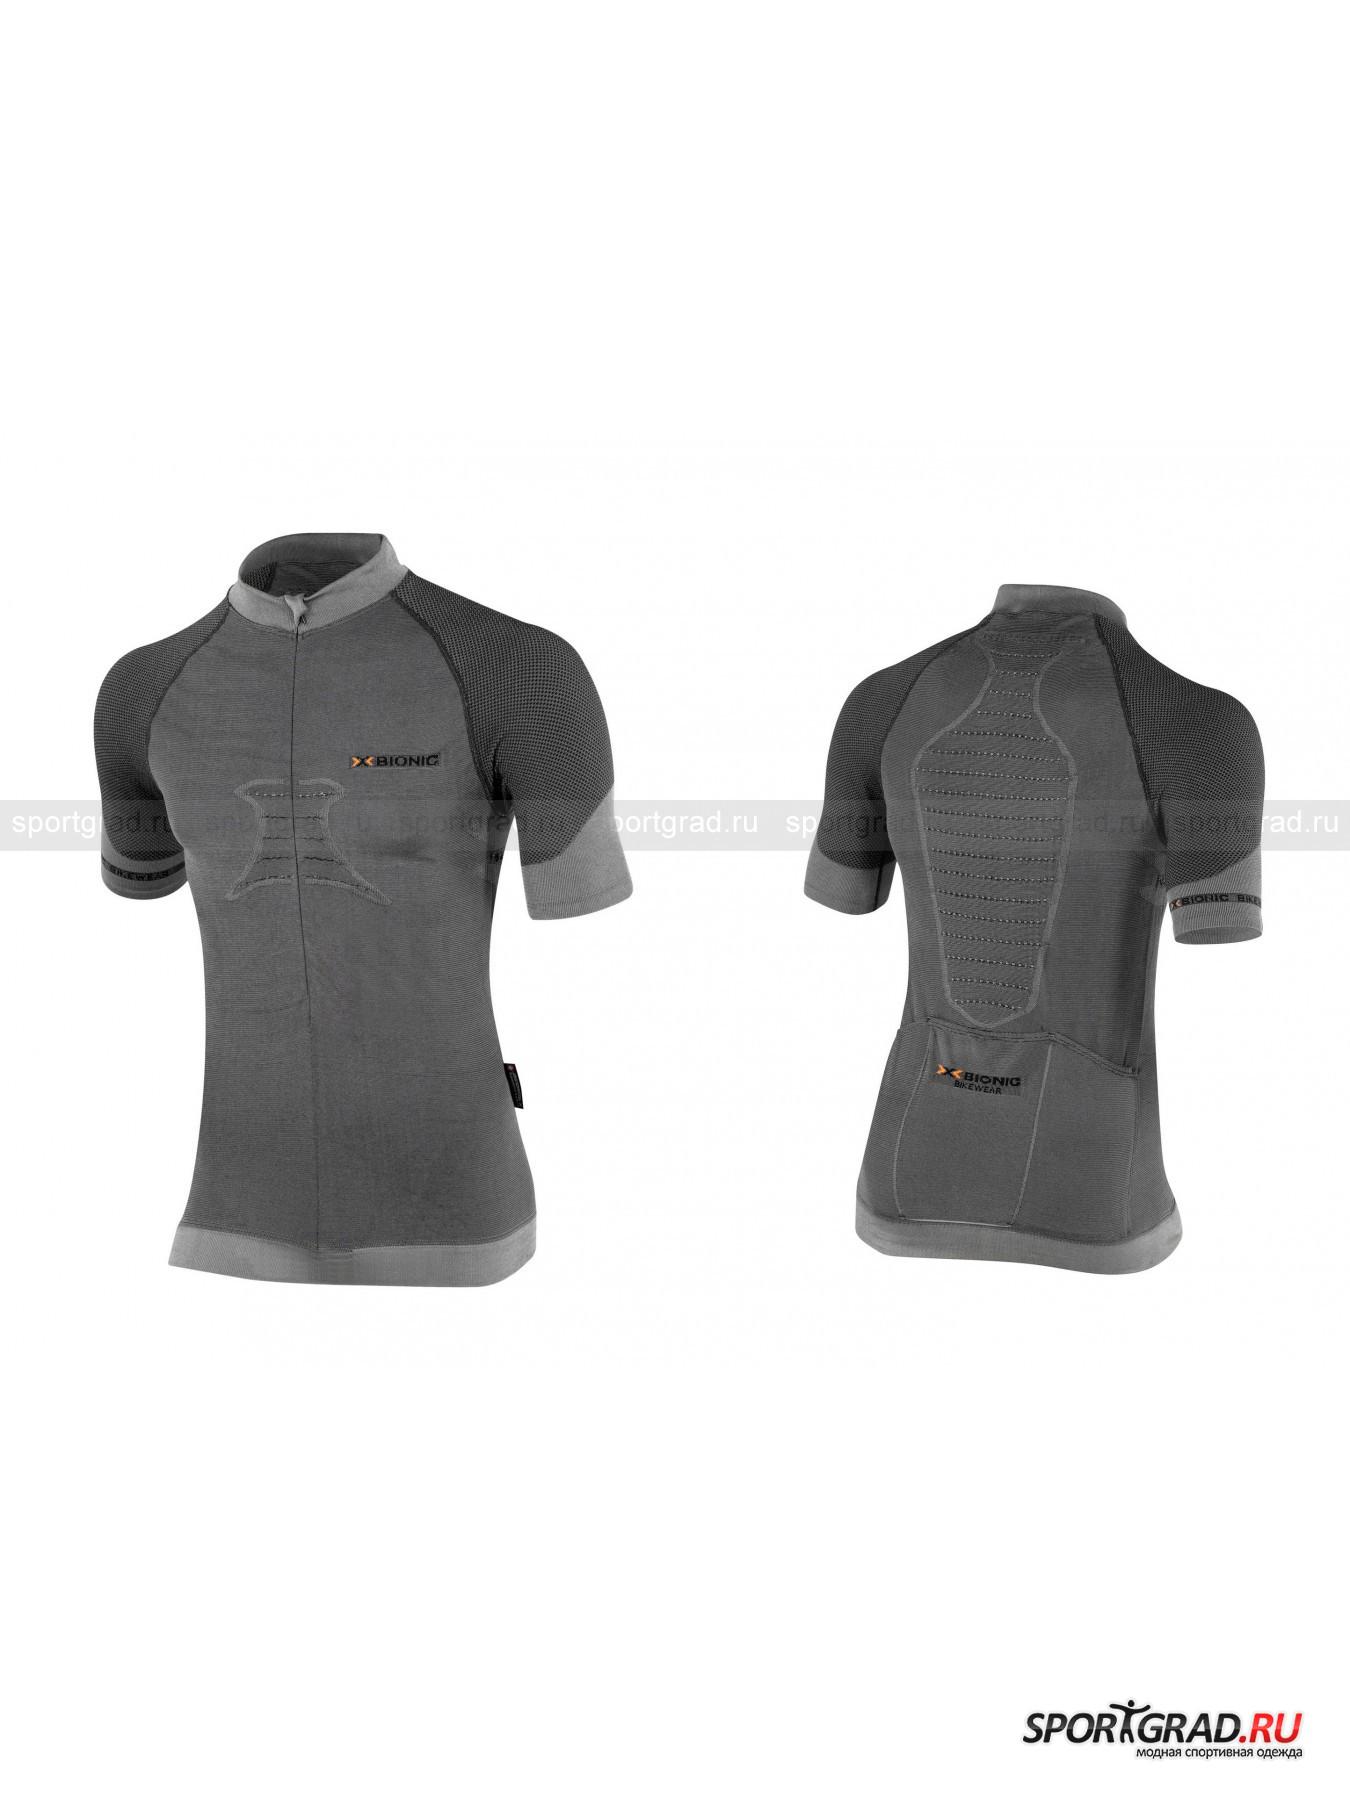 �����: ������������� ������� X-BIONIC FENNEC Shirt Short Sleeves Zip Up � �������� ������� ��� ����������